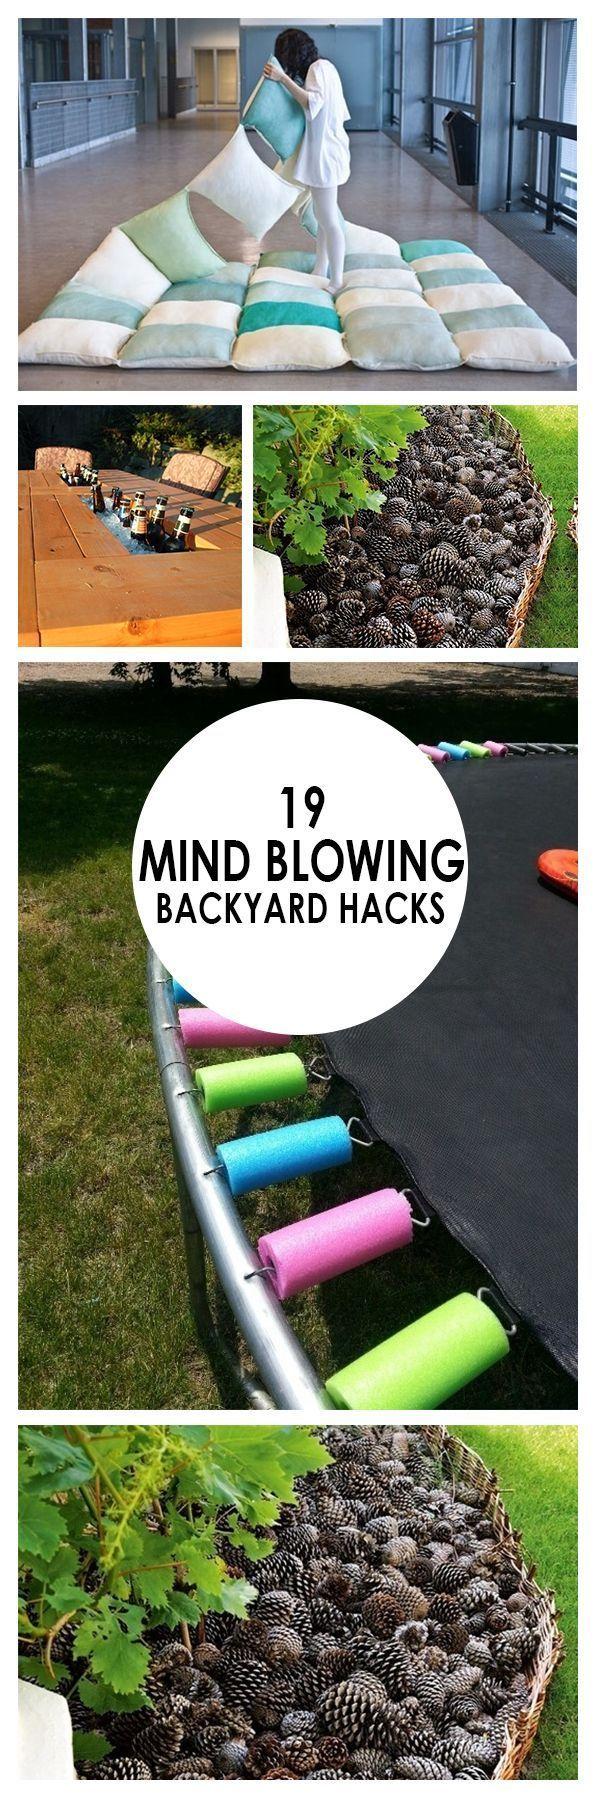 19 Mind Blowing Backyard Hacks Backyard Outdoor Gardens 400 x 300